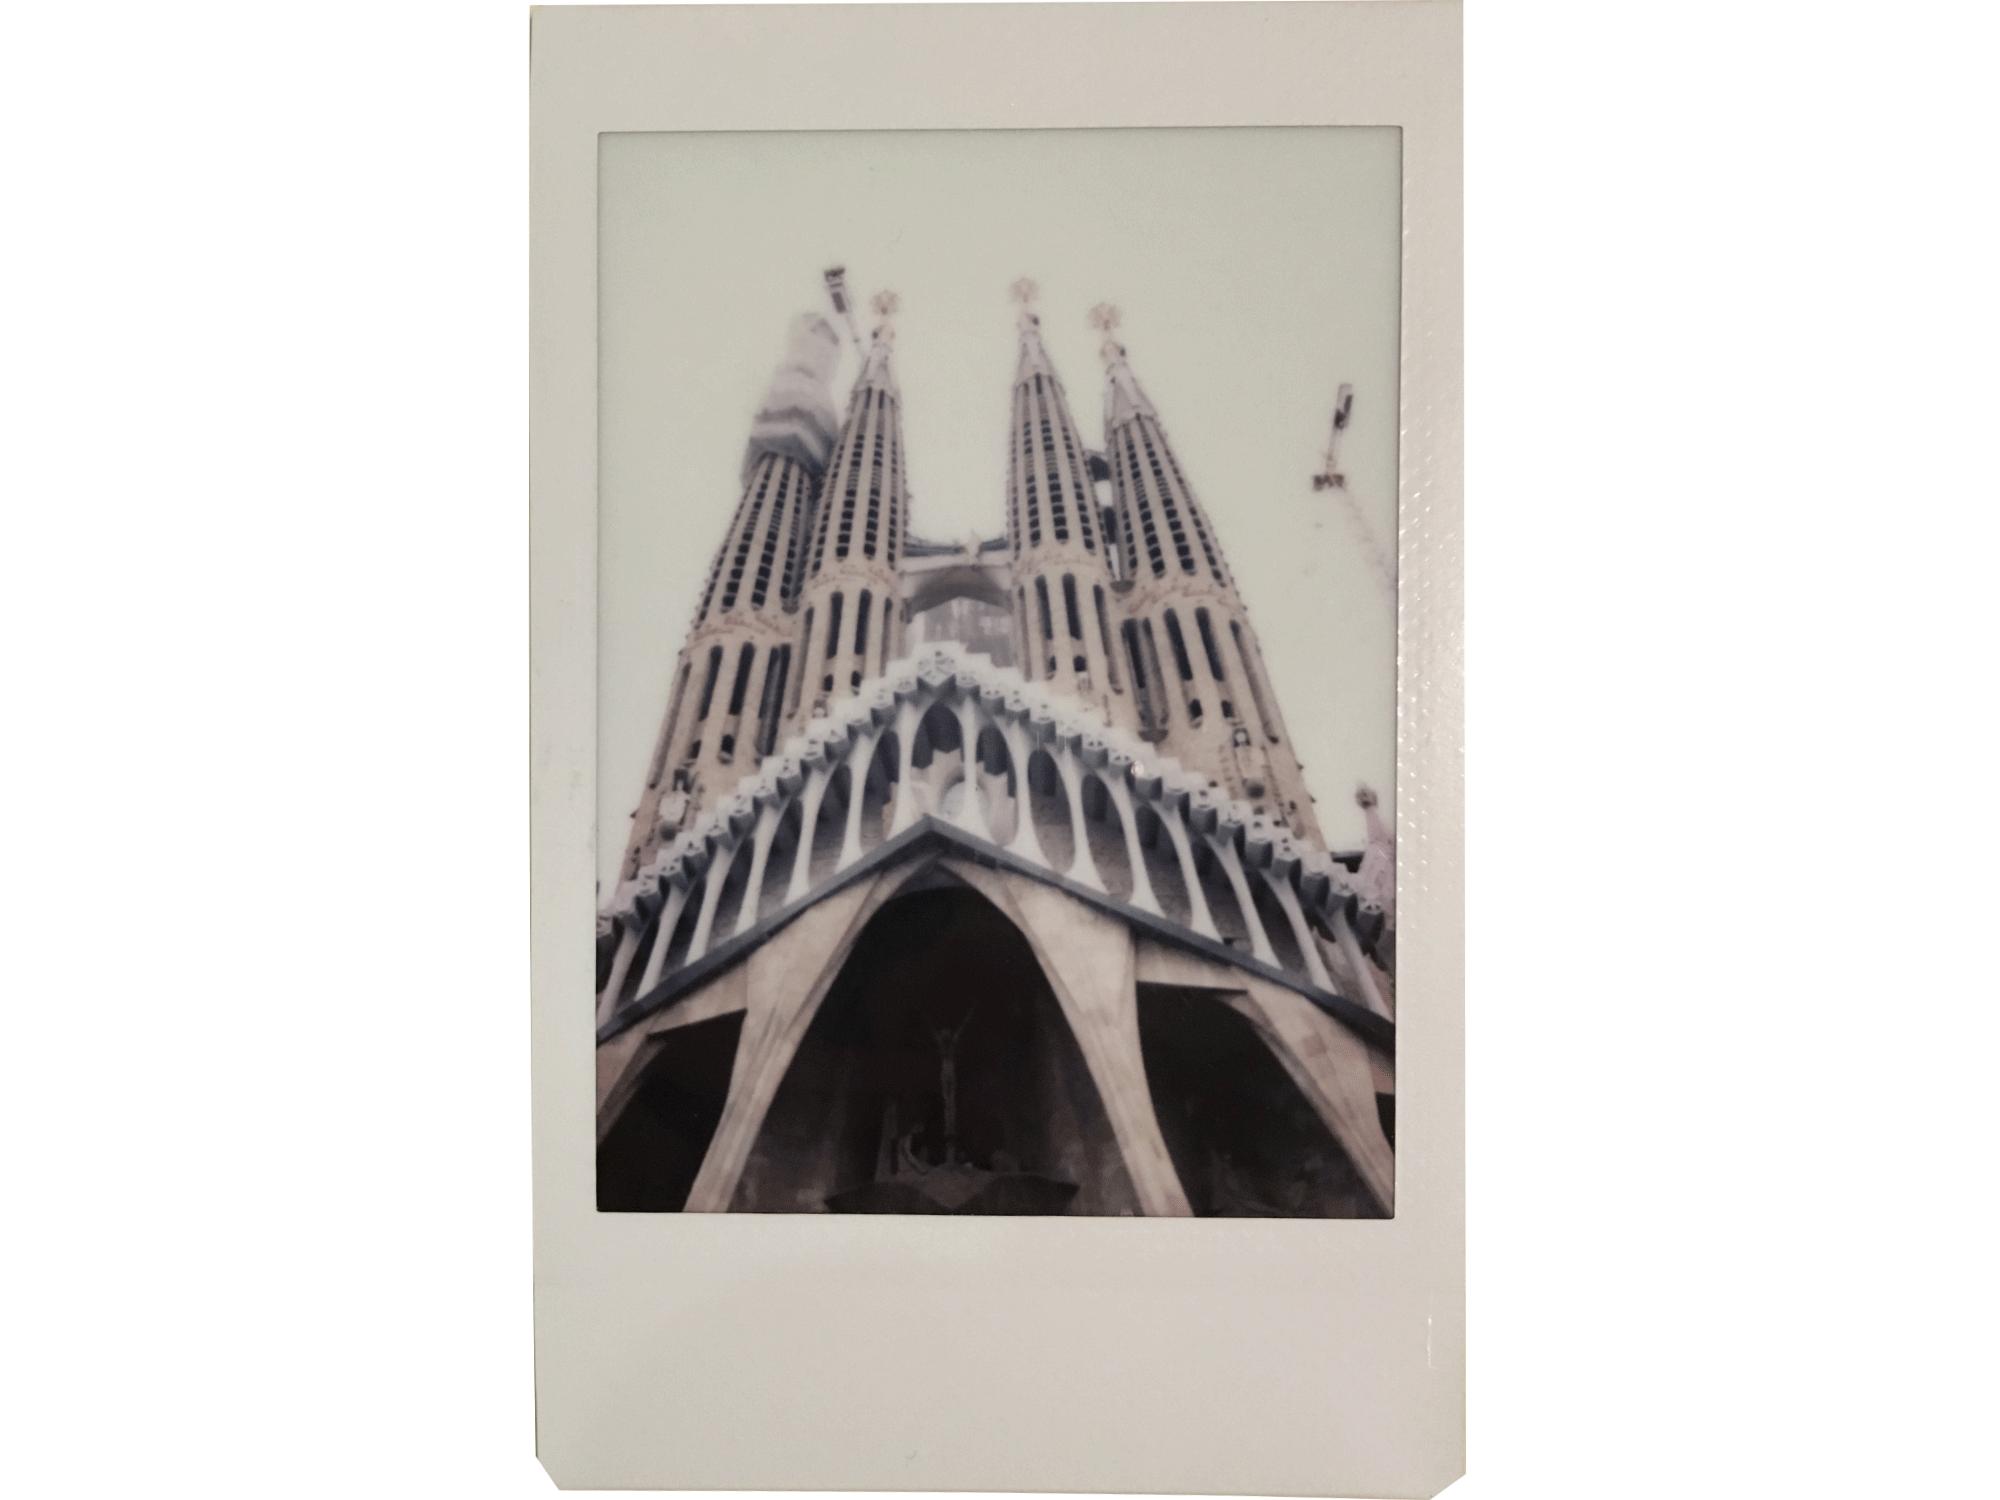 Can't wait to see this finished  La Sagrada Familia, Barcelona, Spain